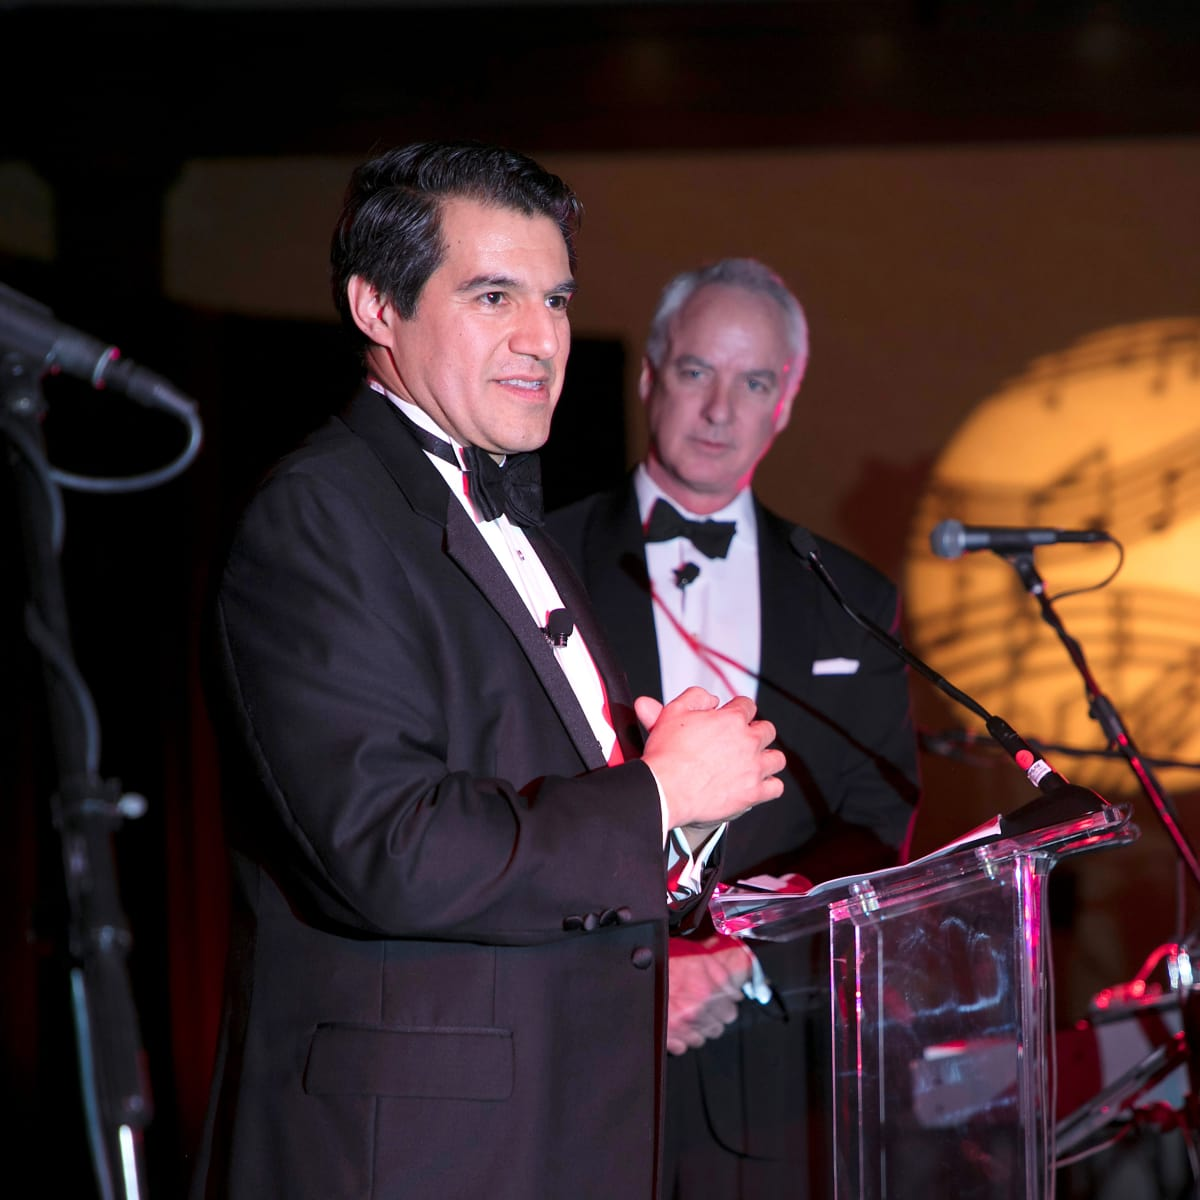 Miguel Harth-Bedoya, FW Symphony Gala 2018